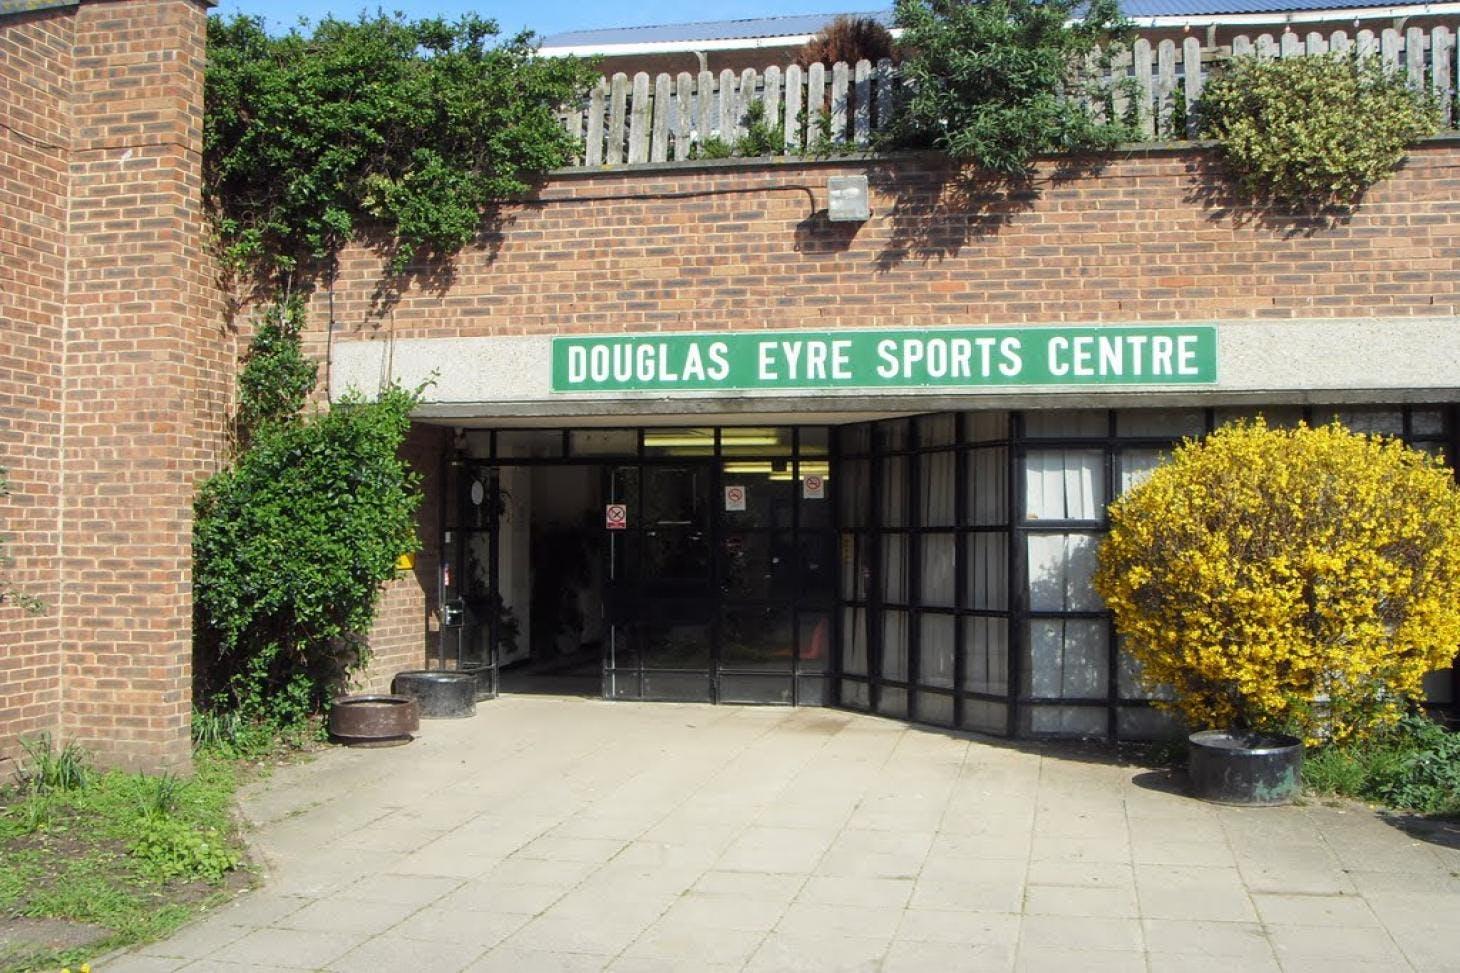 Douglas Eyre Sports Centre Nets   Artificial cricket facilities